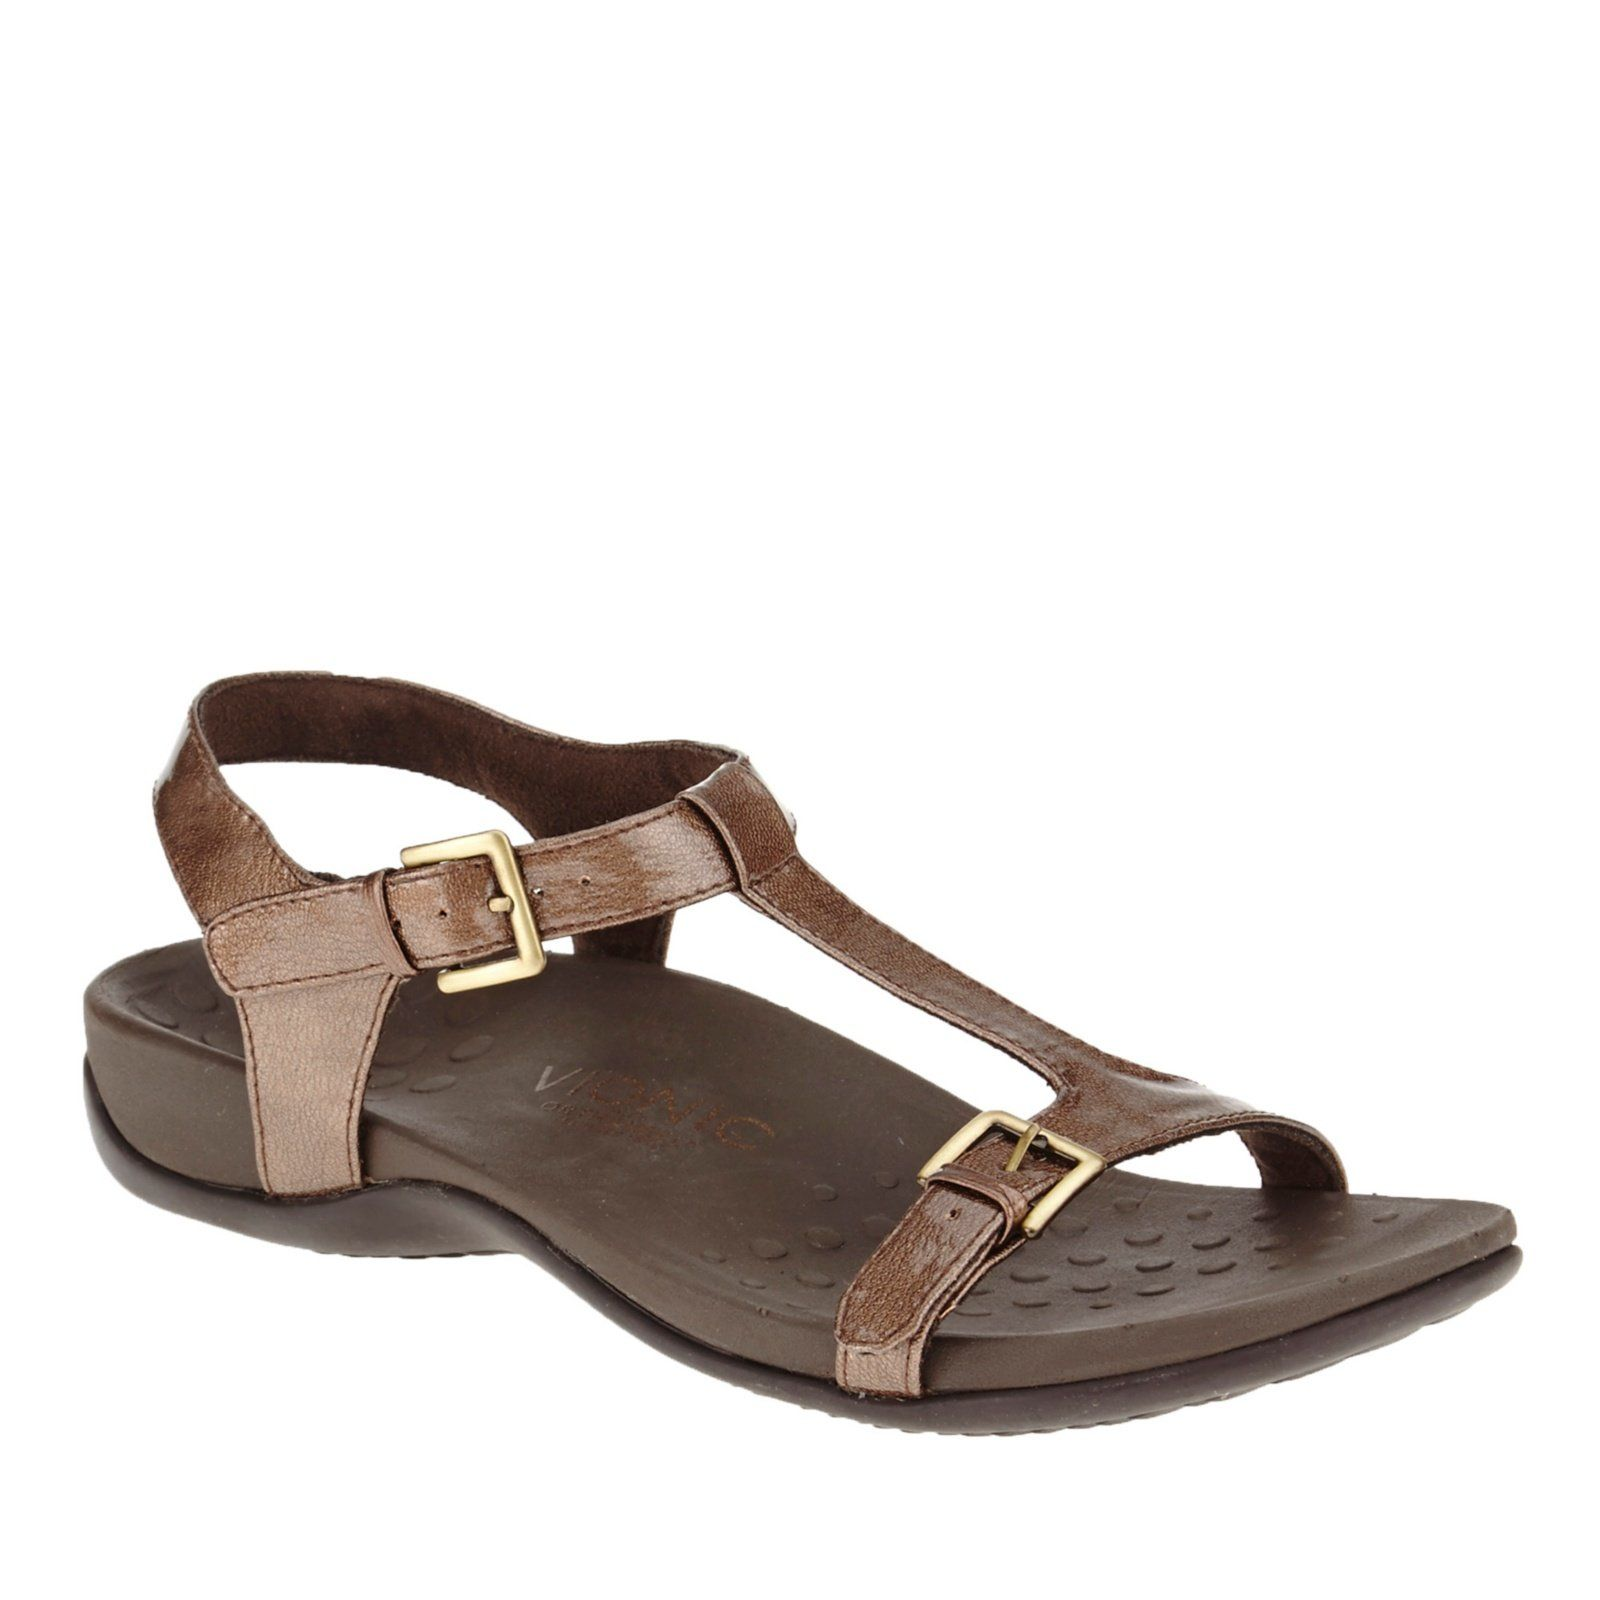 3bbbc7cf4ec AmazonSmile  Vionic with Orthaheel Technology Women s Adriane  Shoes ...